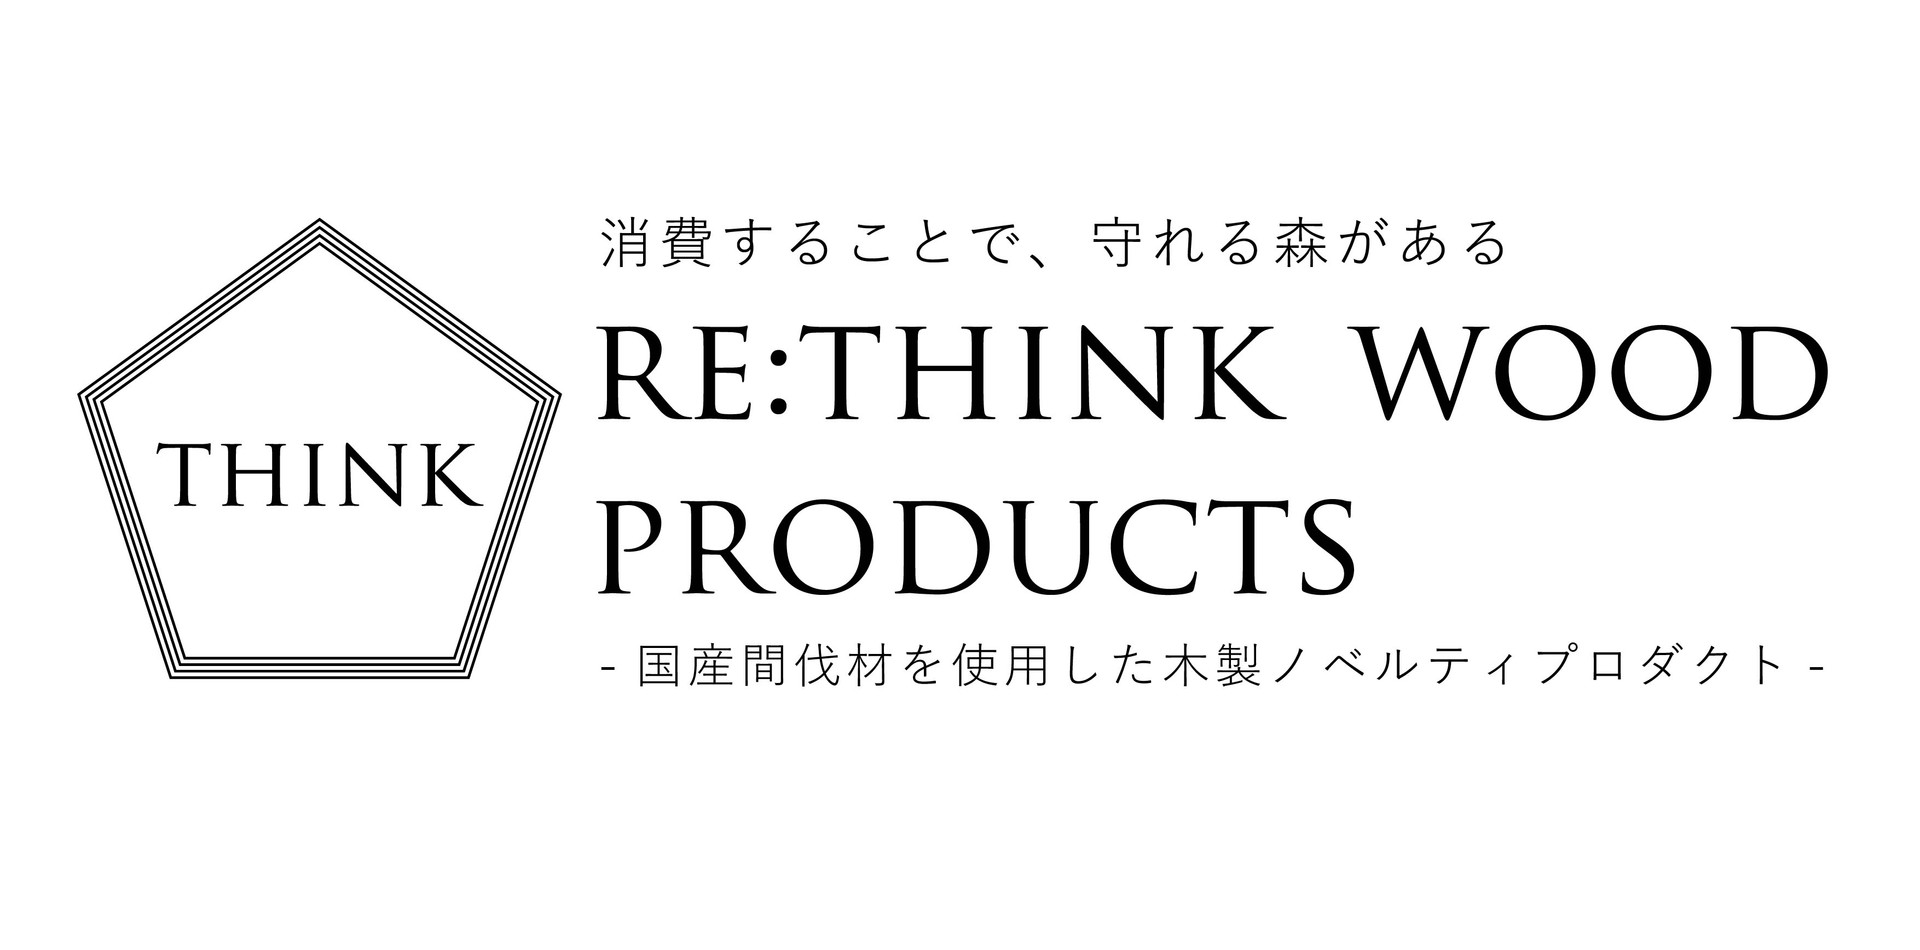 rethinkwoodproducts1.jpg